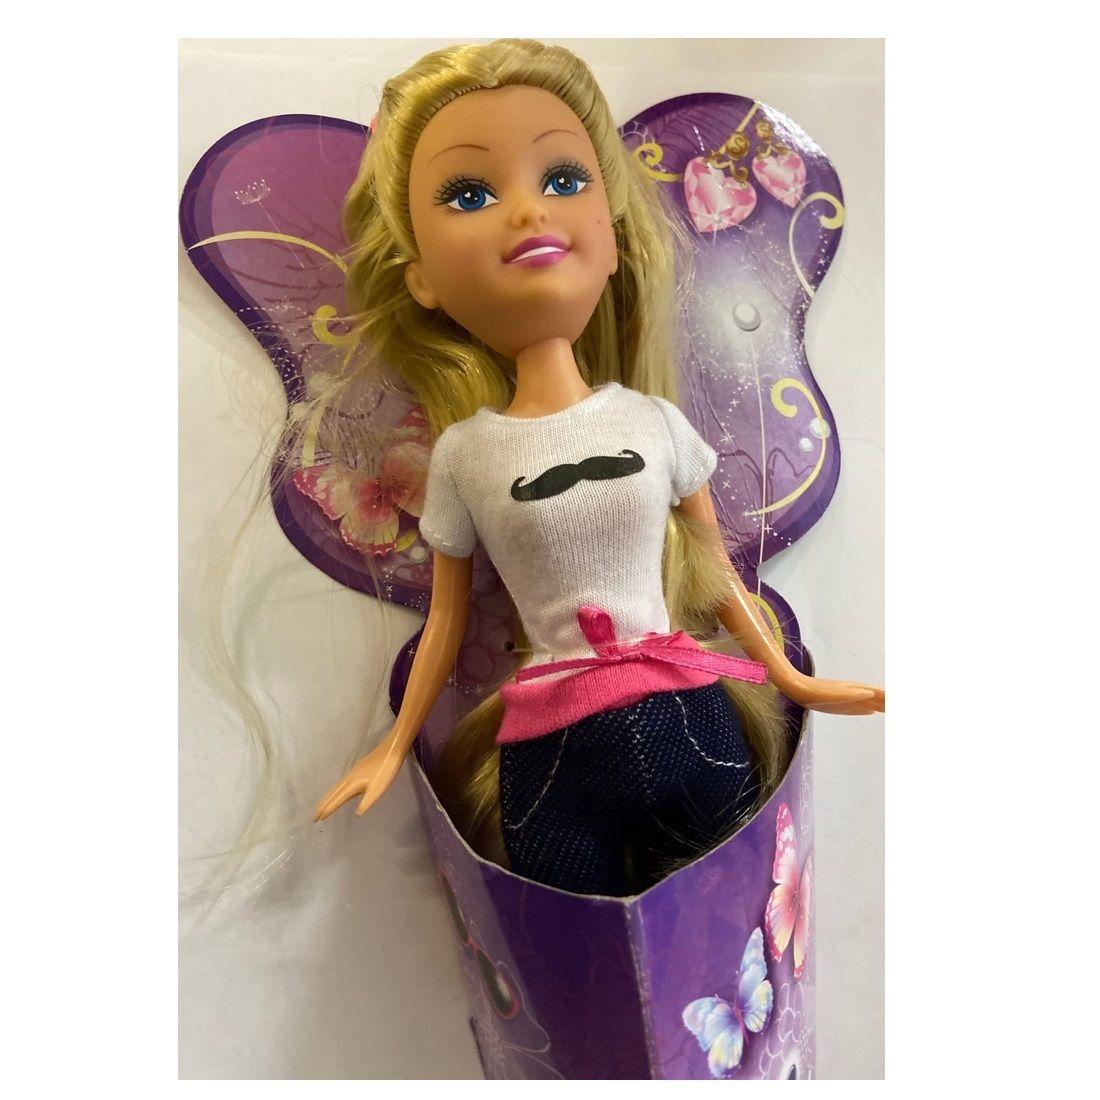 Кукла Sparkle Girlz - Модница в белой кофточке